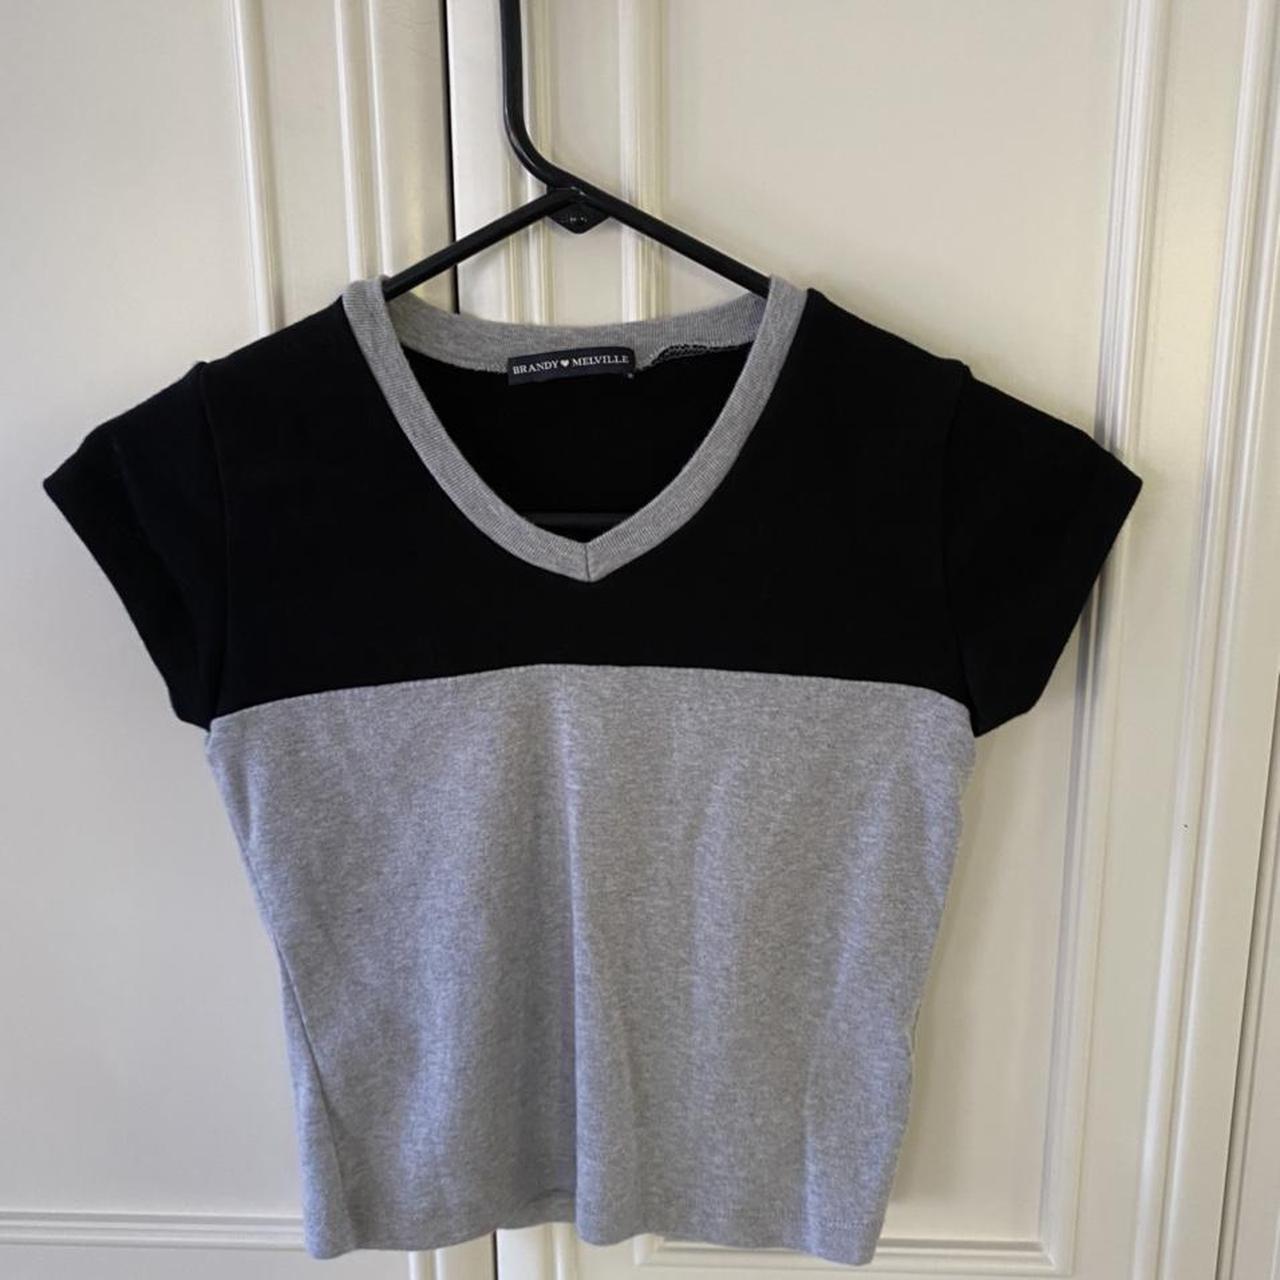 Product Image 1 - Brandy Melville v neck top